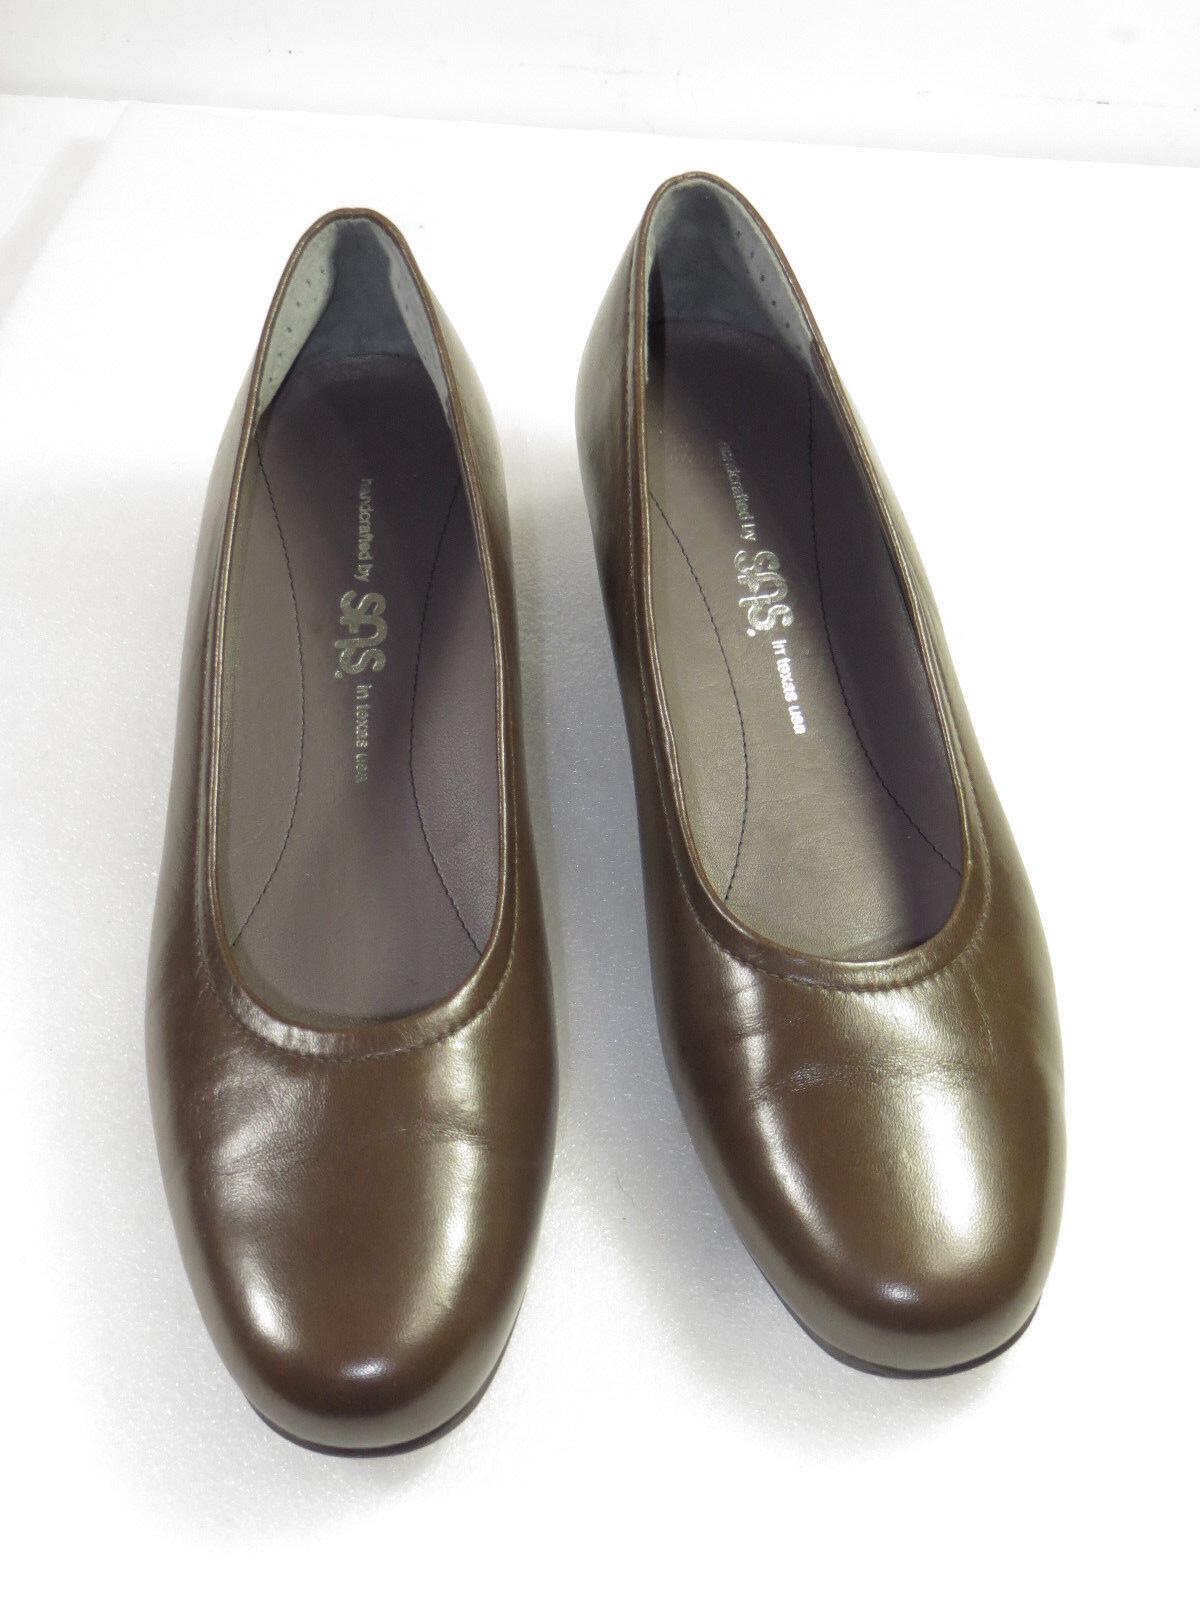 Beauty SAS REGINA ITALIA pompe classiche short  Heel slip on,comy,walk 7.5N  224  consegna rapida